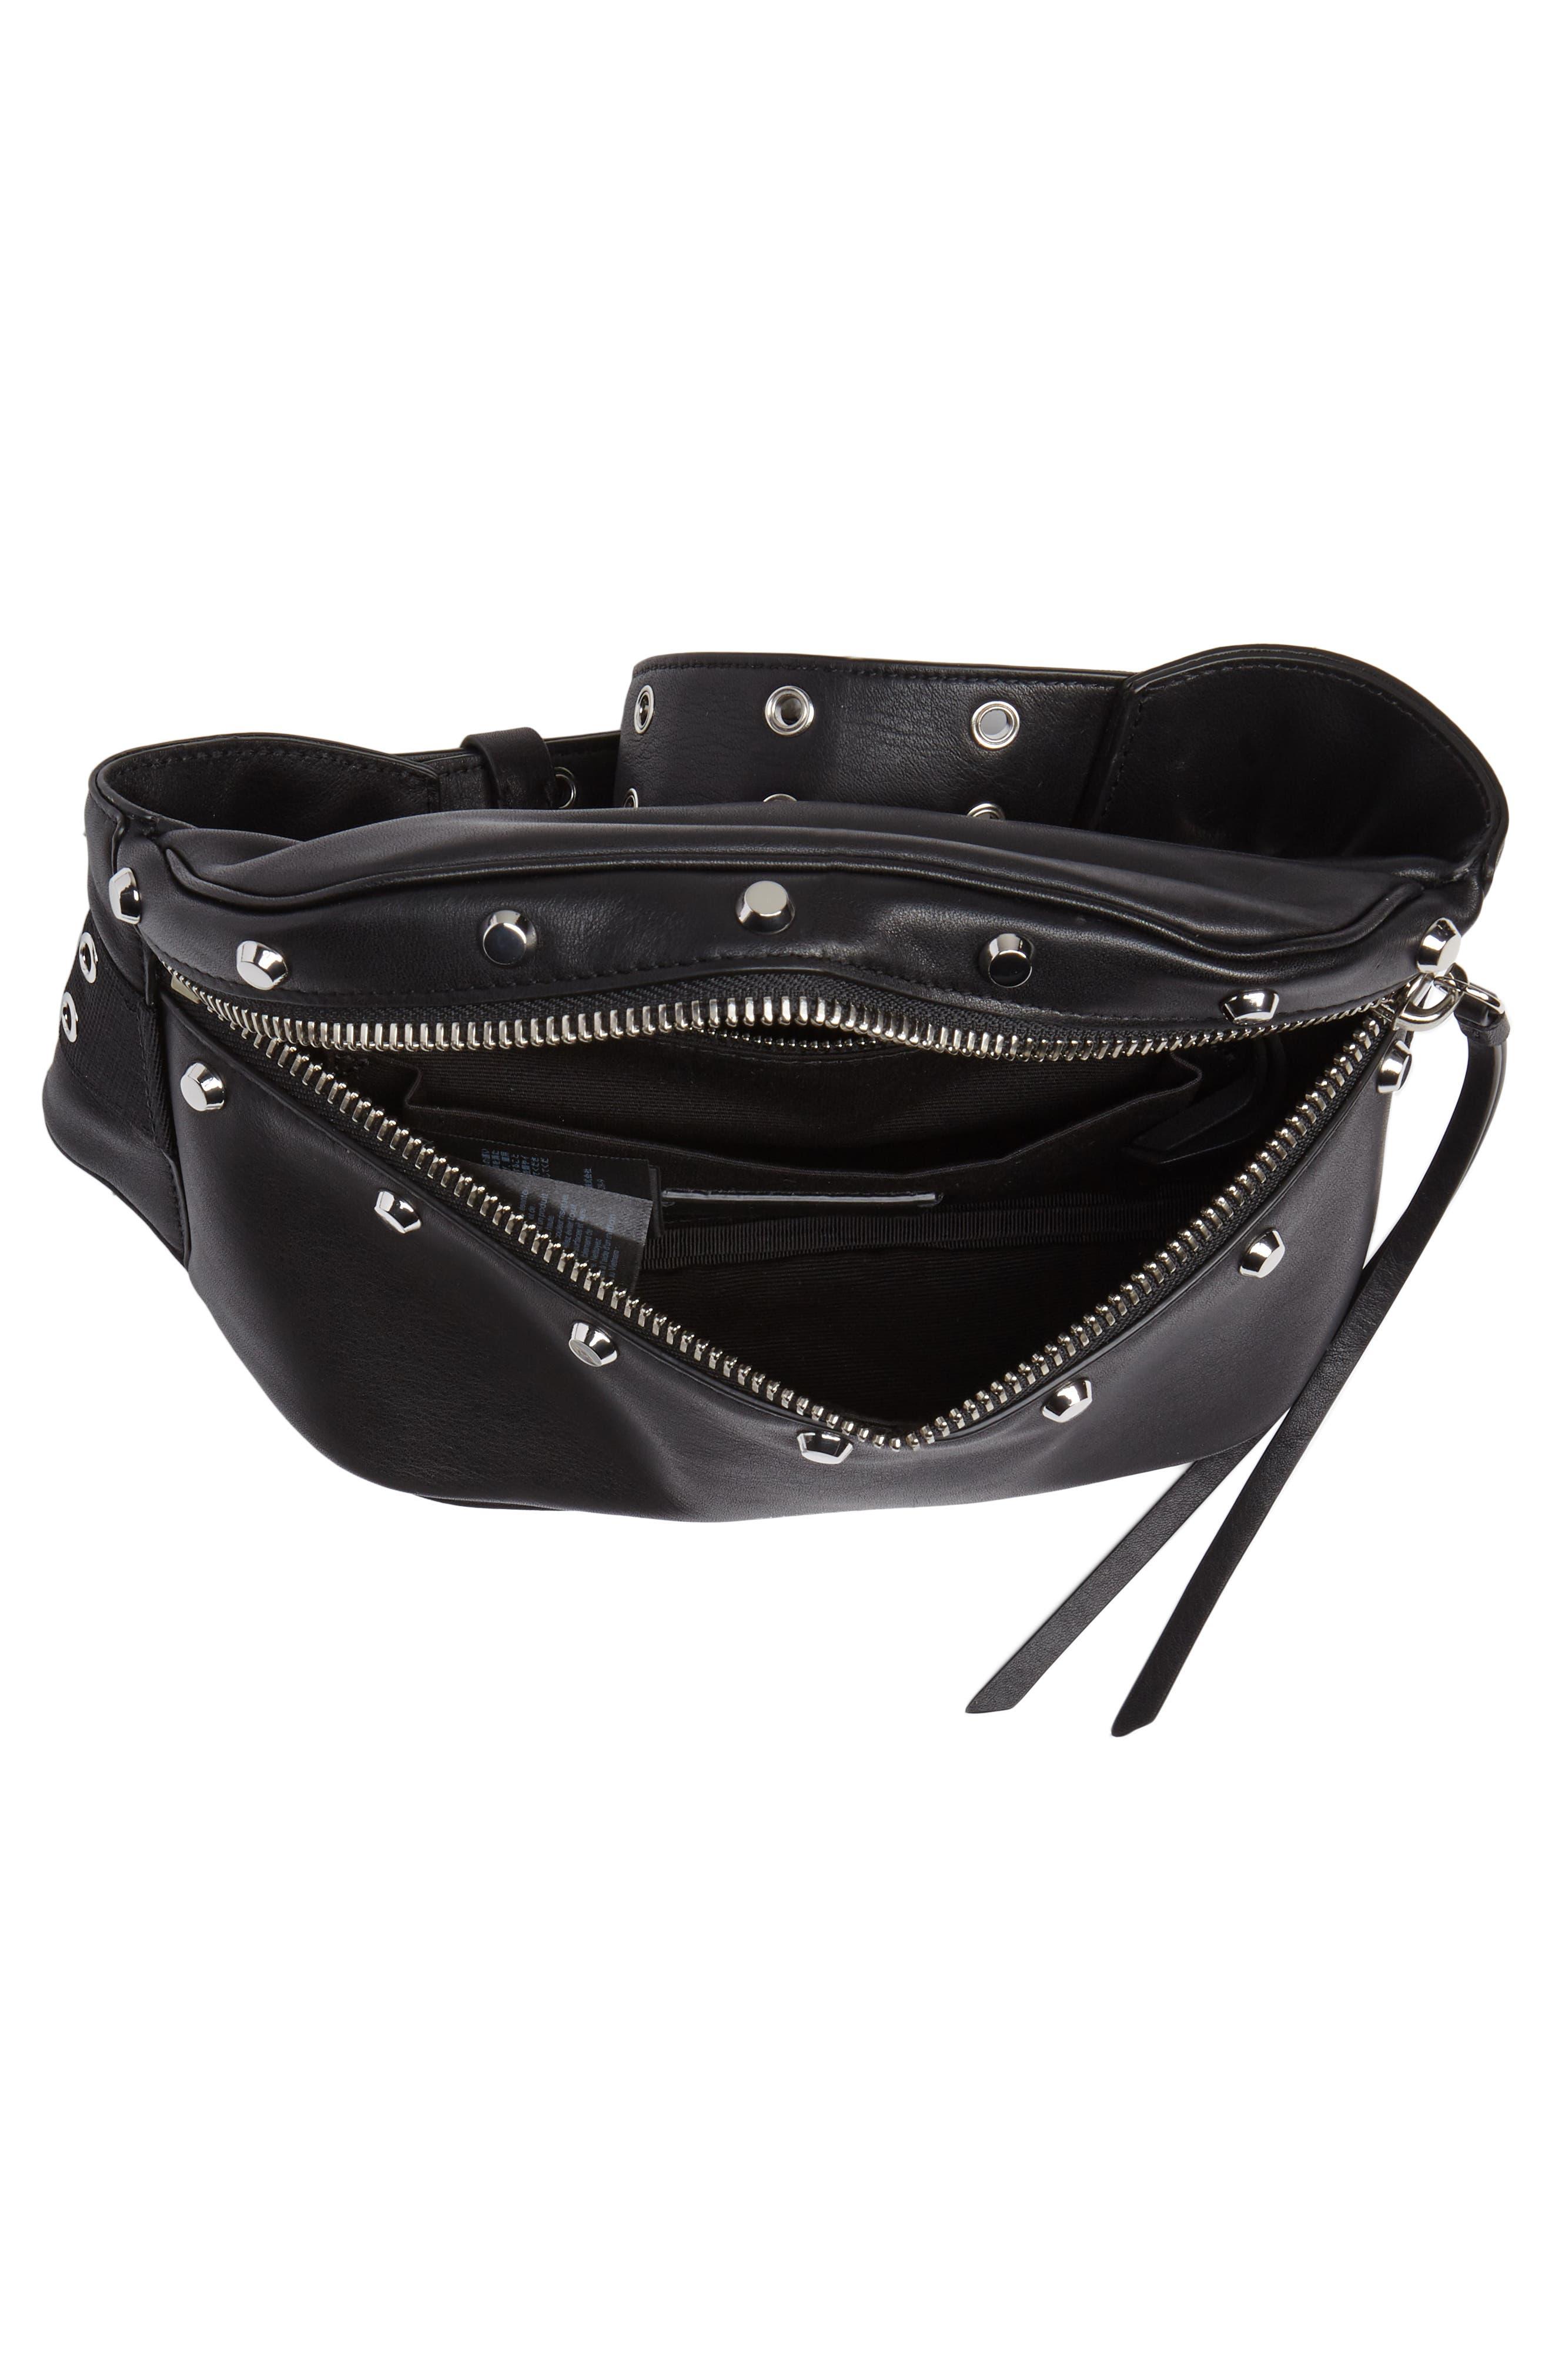 ALLSAINTS, Studded Leather Belt Bag, Alternate thumbnail 6, color, 001